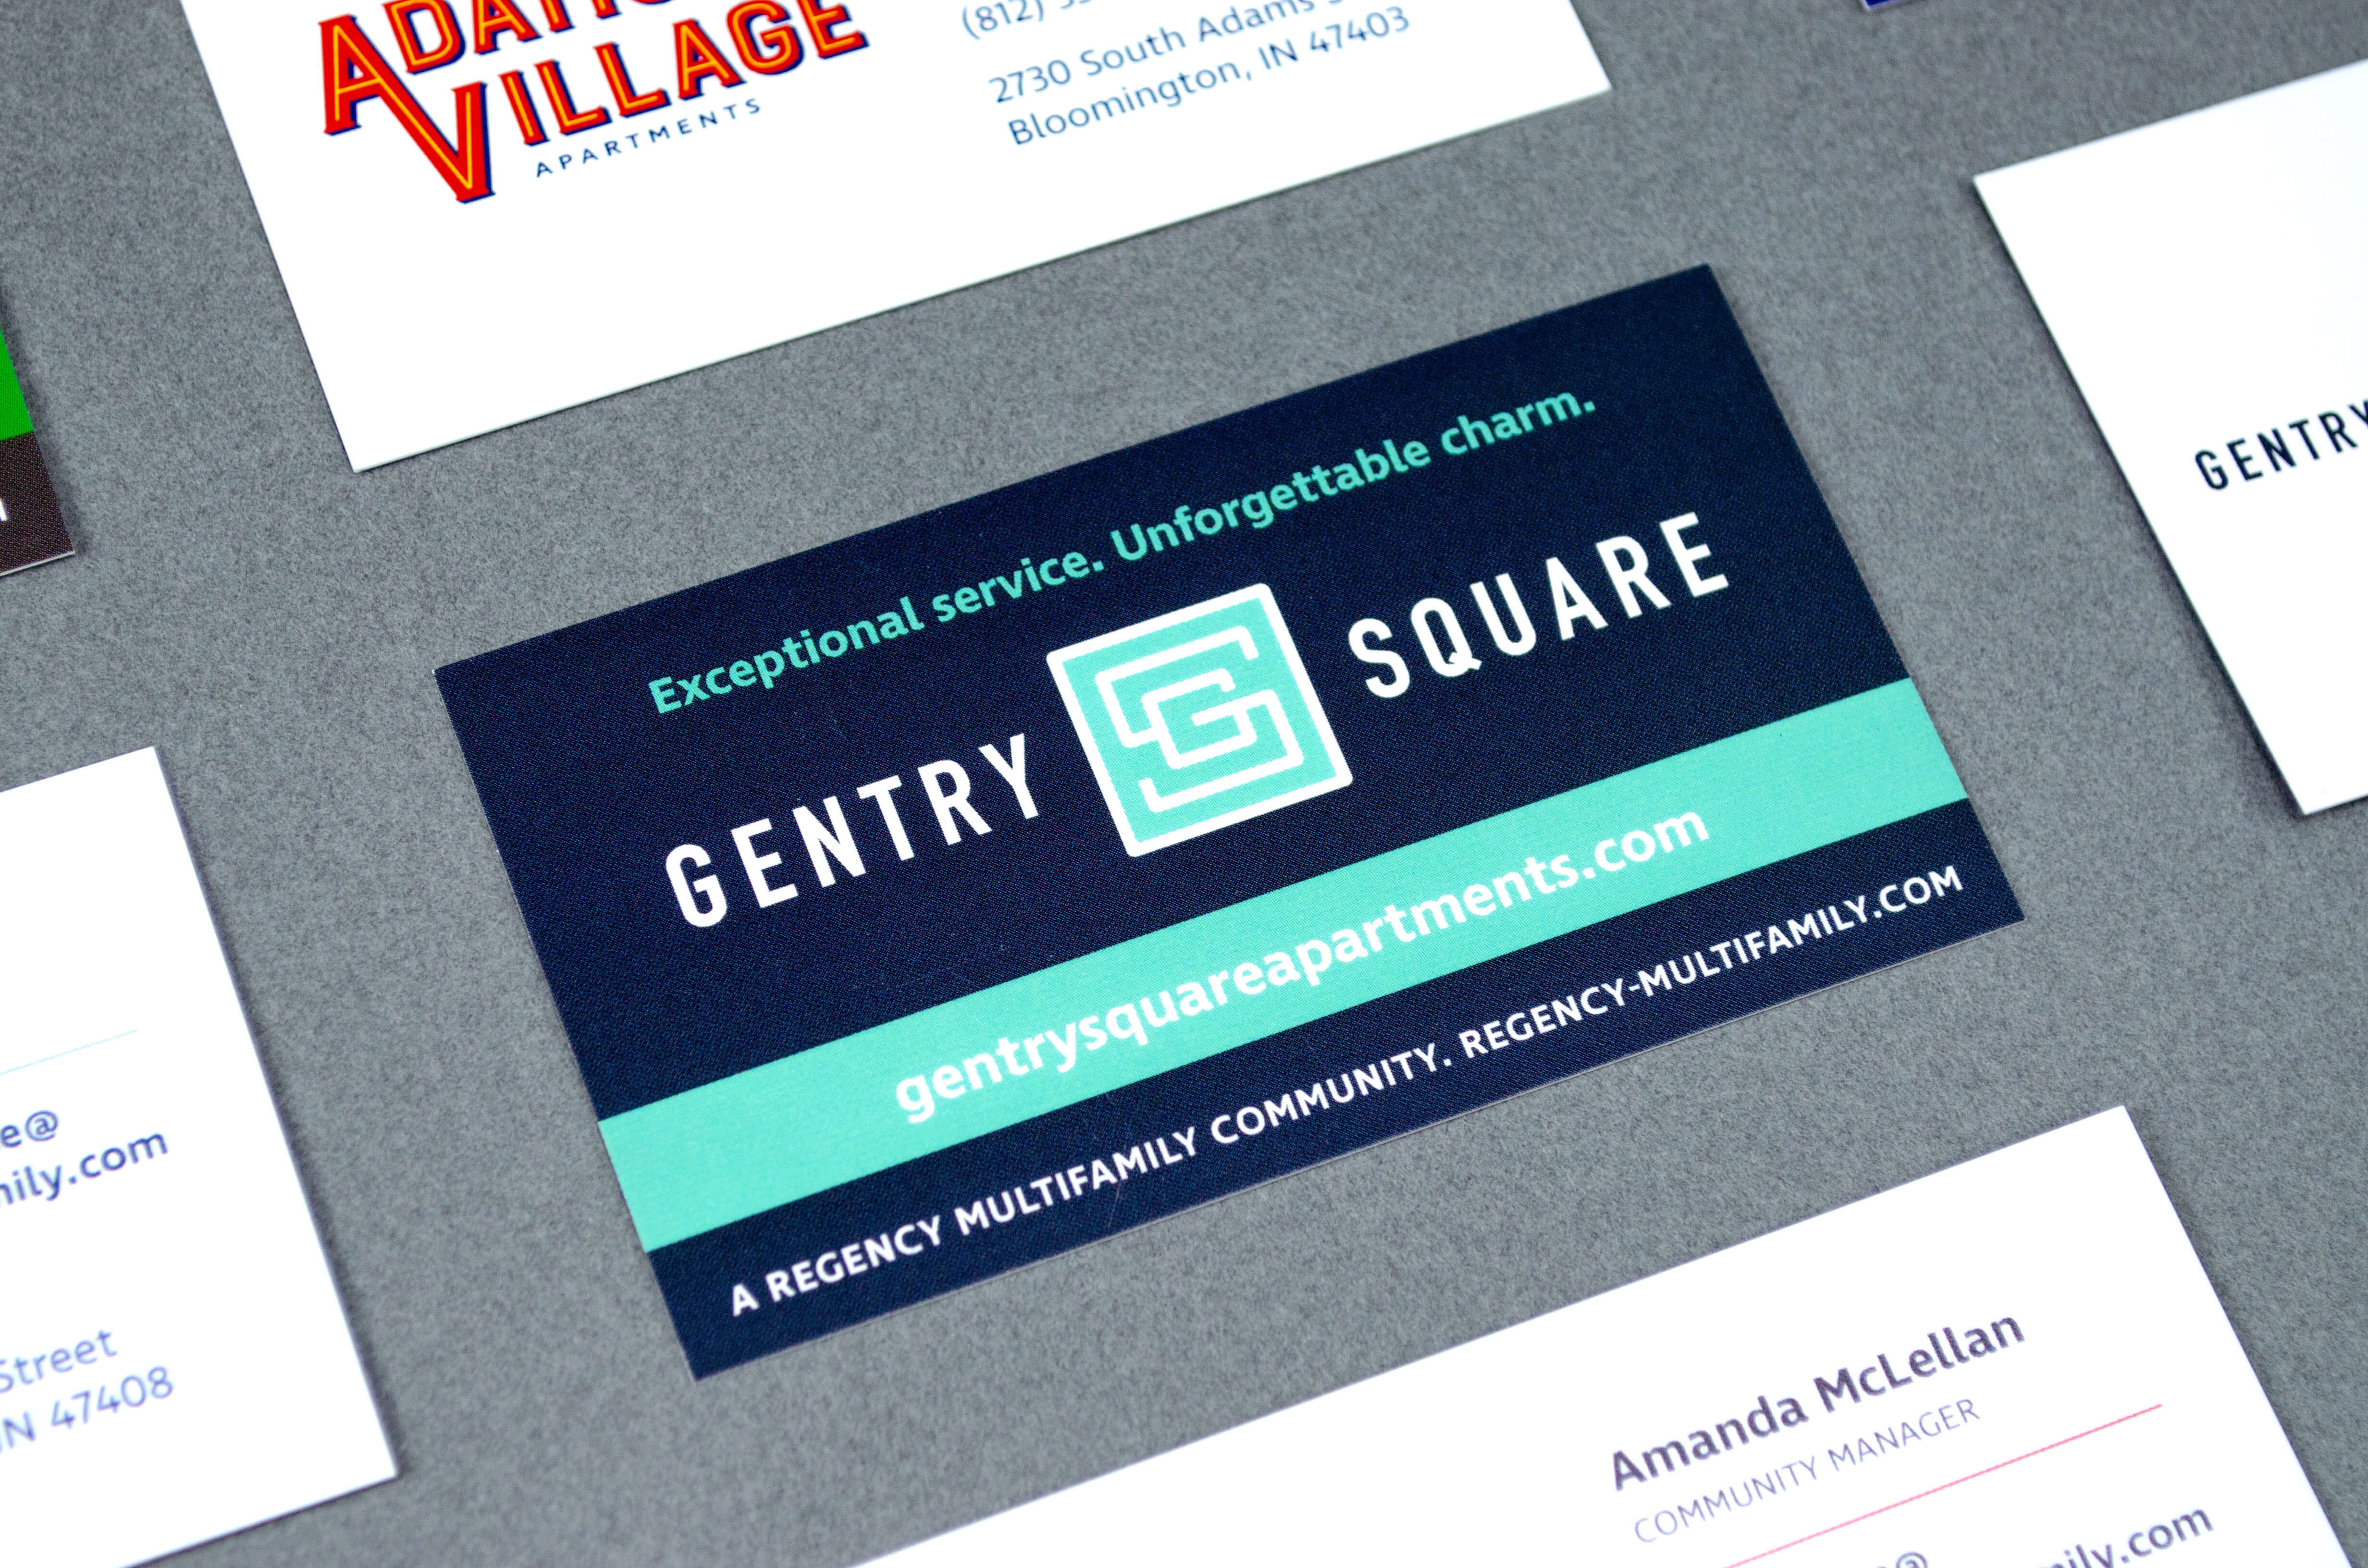 Regency - Gentry Square Apartments - Branding